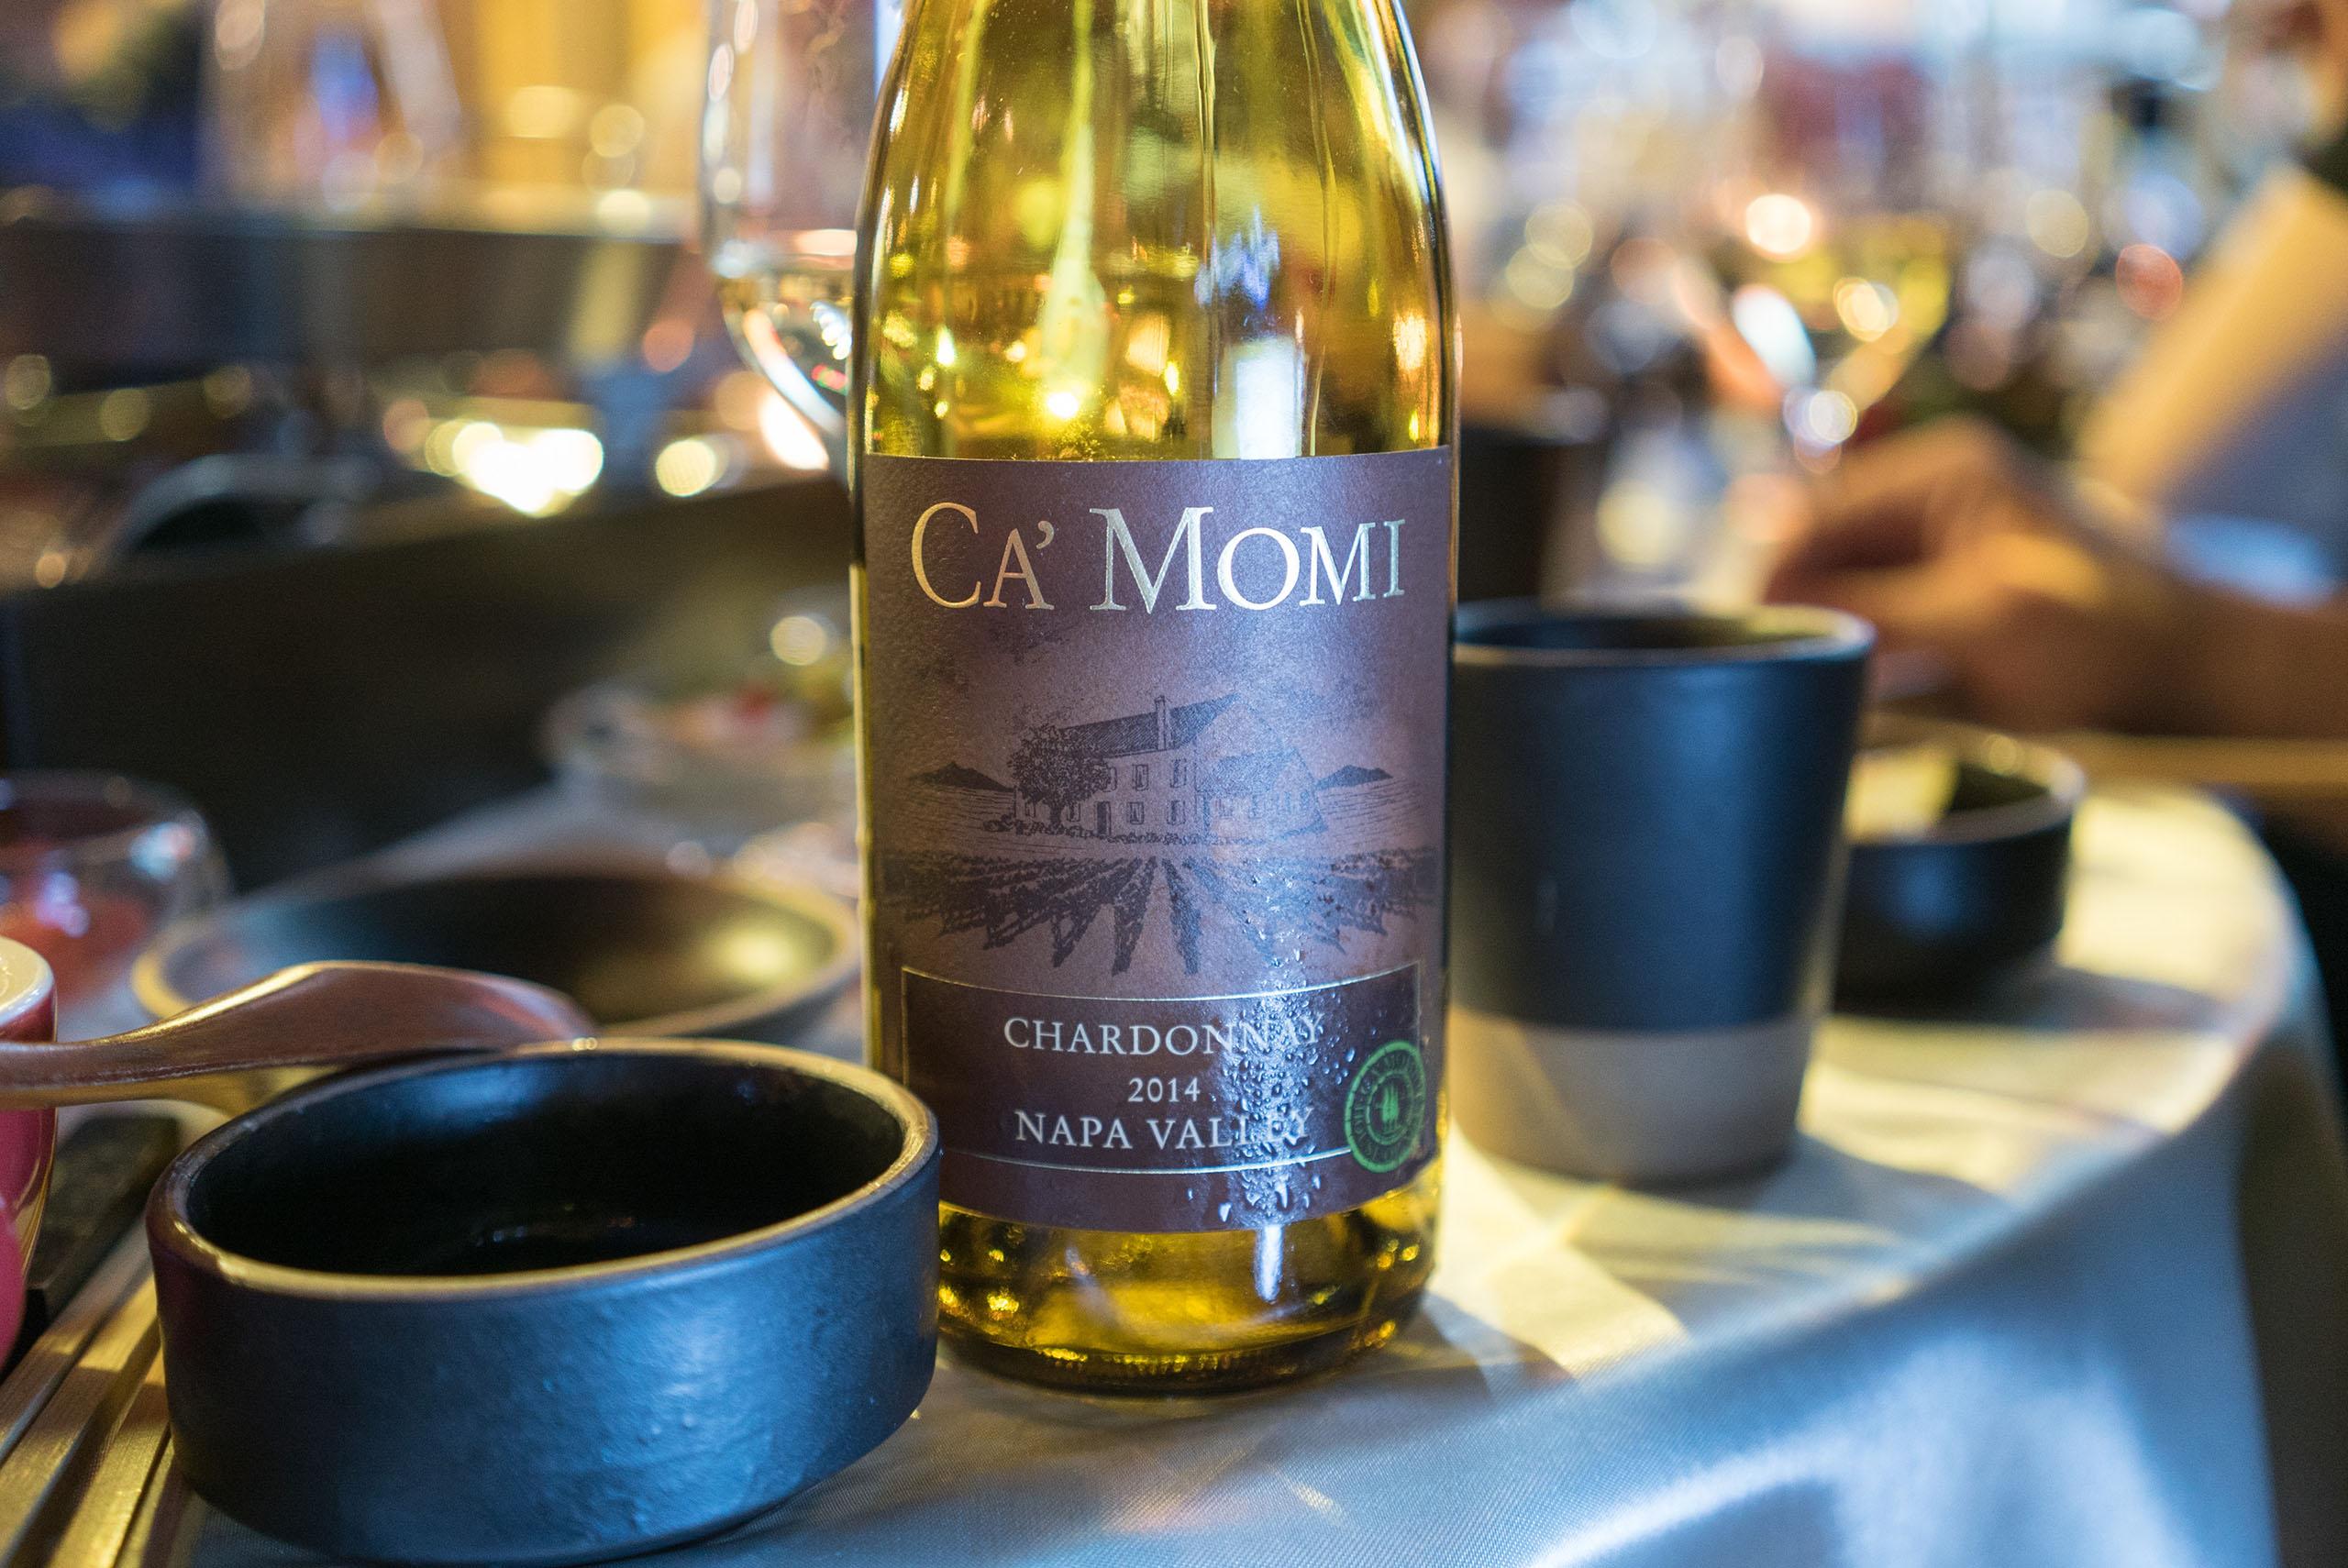 Ca'momi napa valley chardonnay 2014